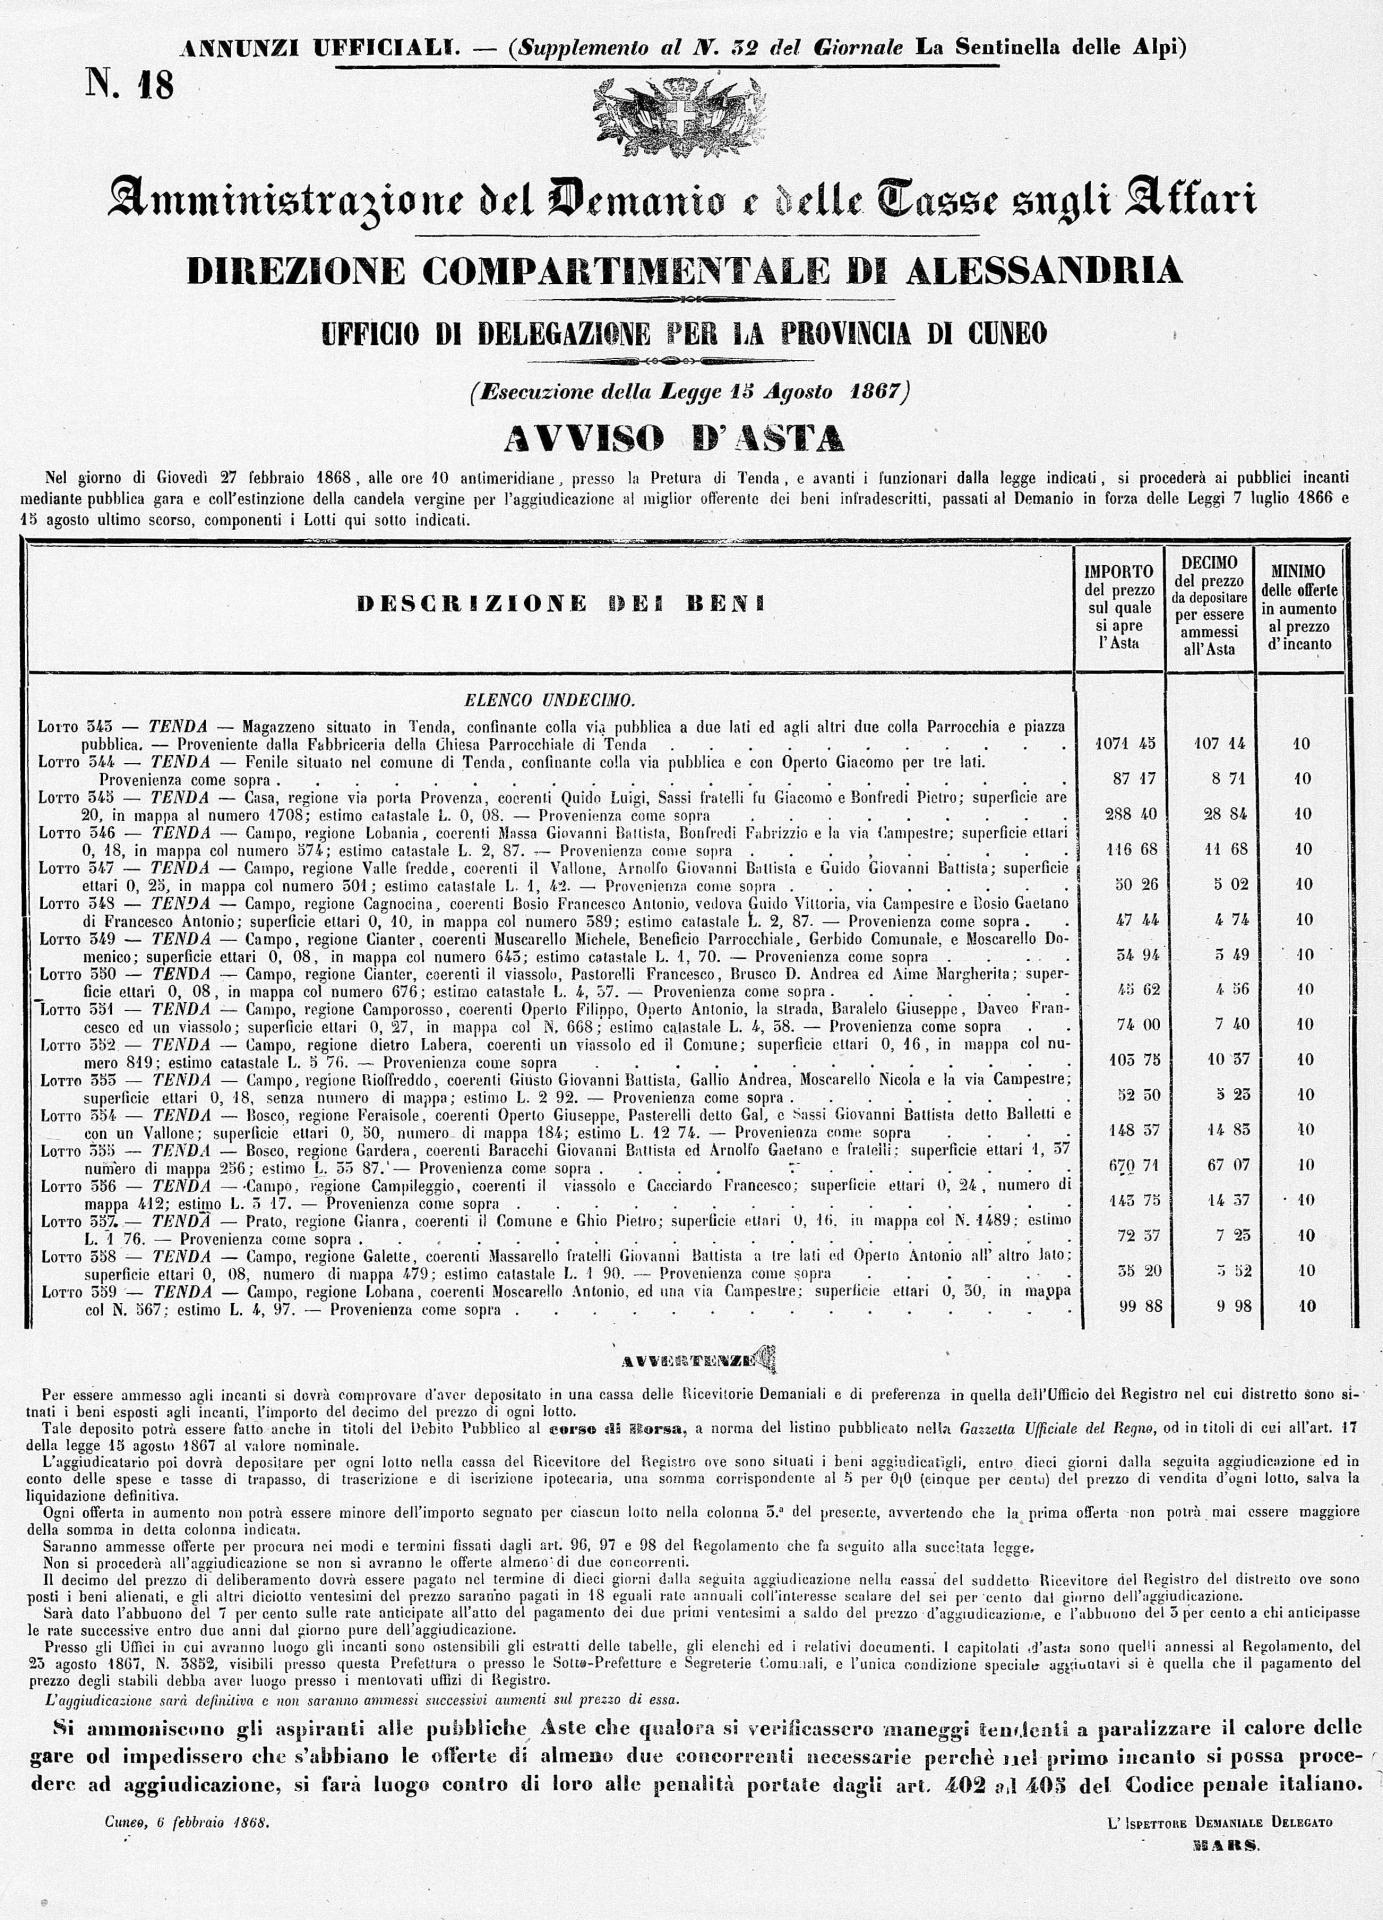 33 du 8 2 1868